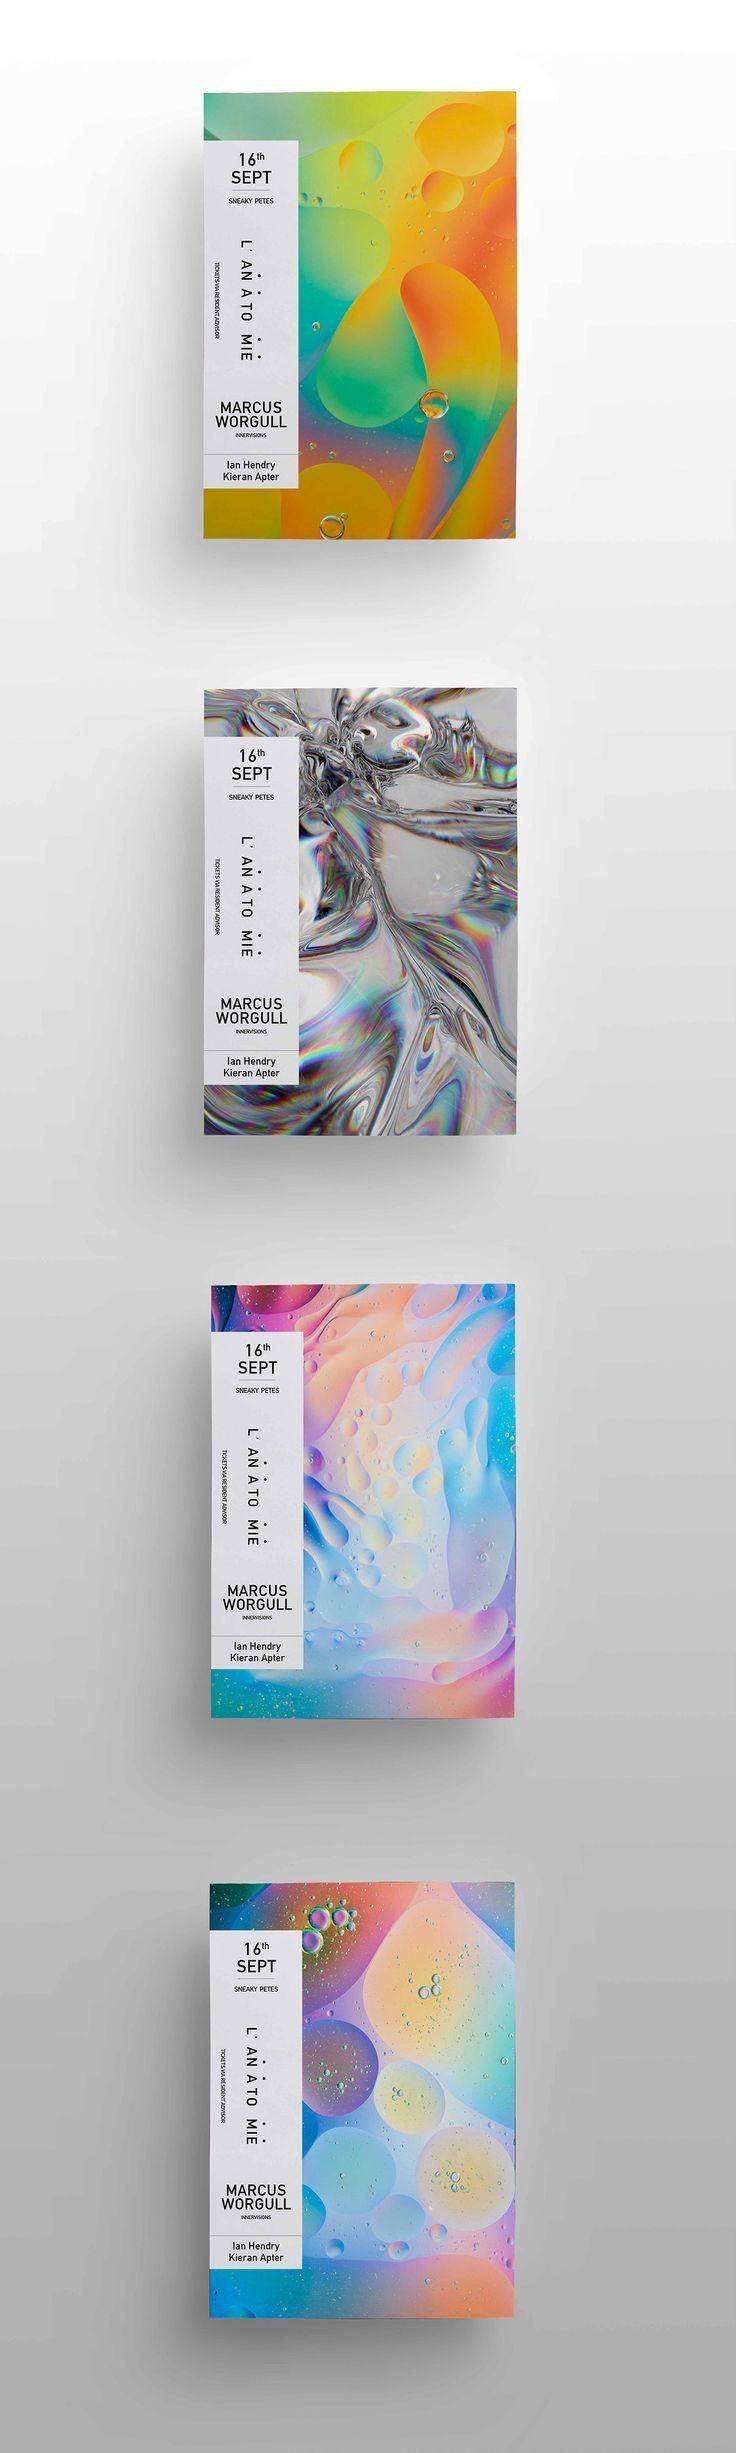 Poster design reference - Gallery Print Design Inspiration